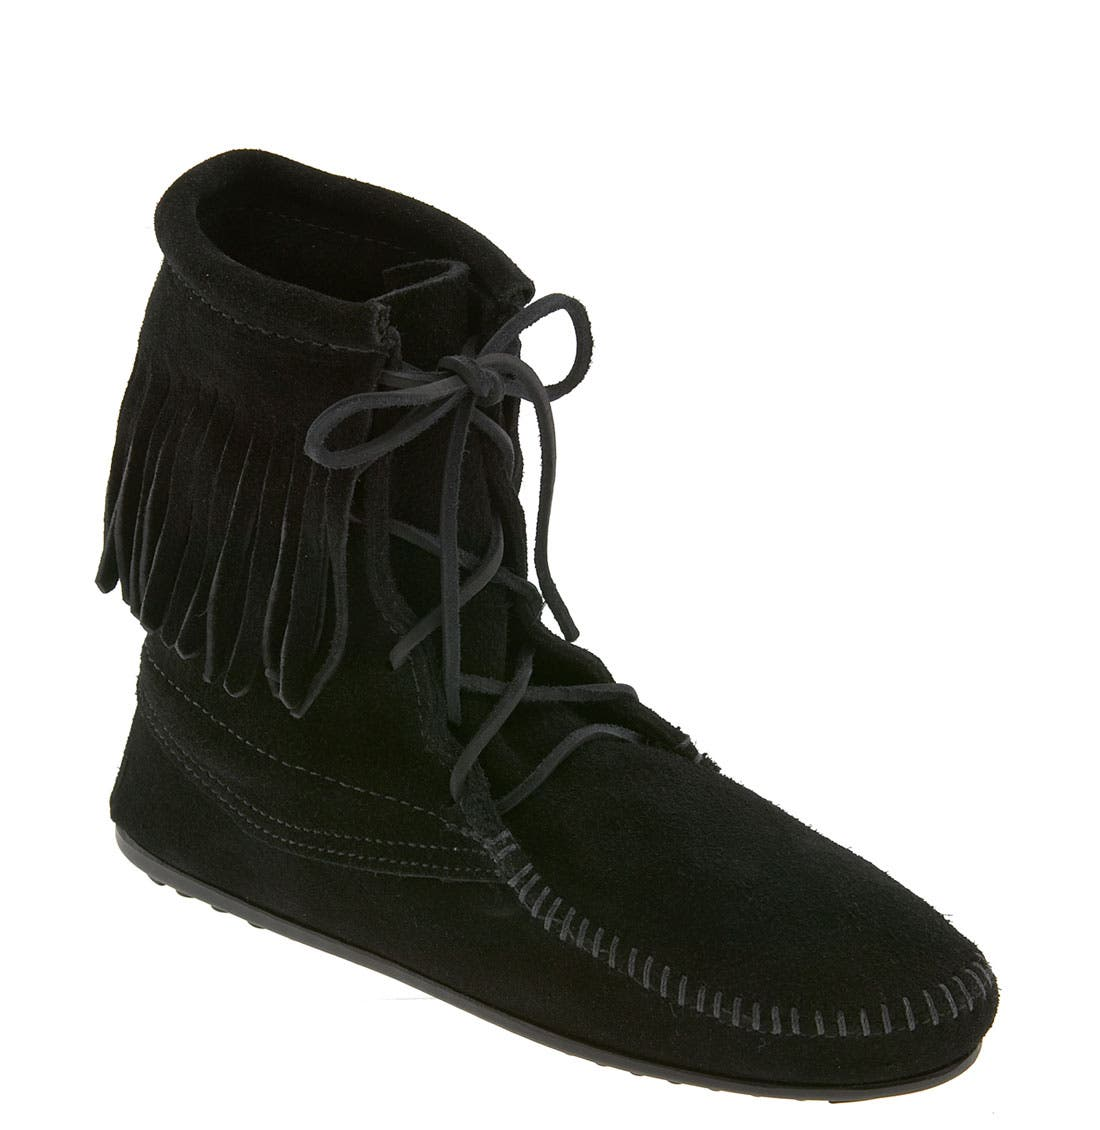 Alternate Image 1 Selected - Minnetonka 'Tramper' Boot